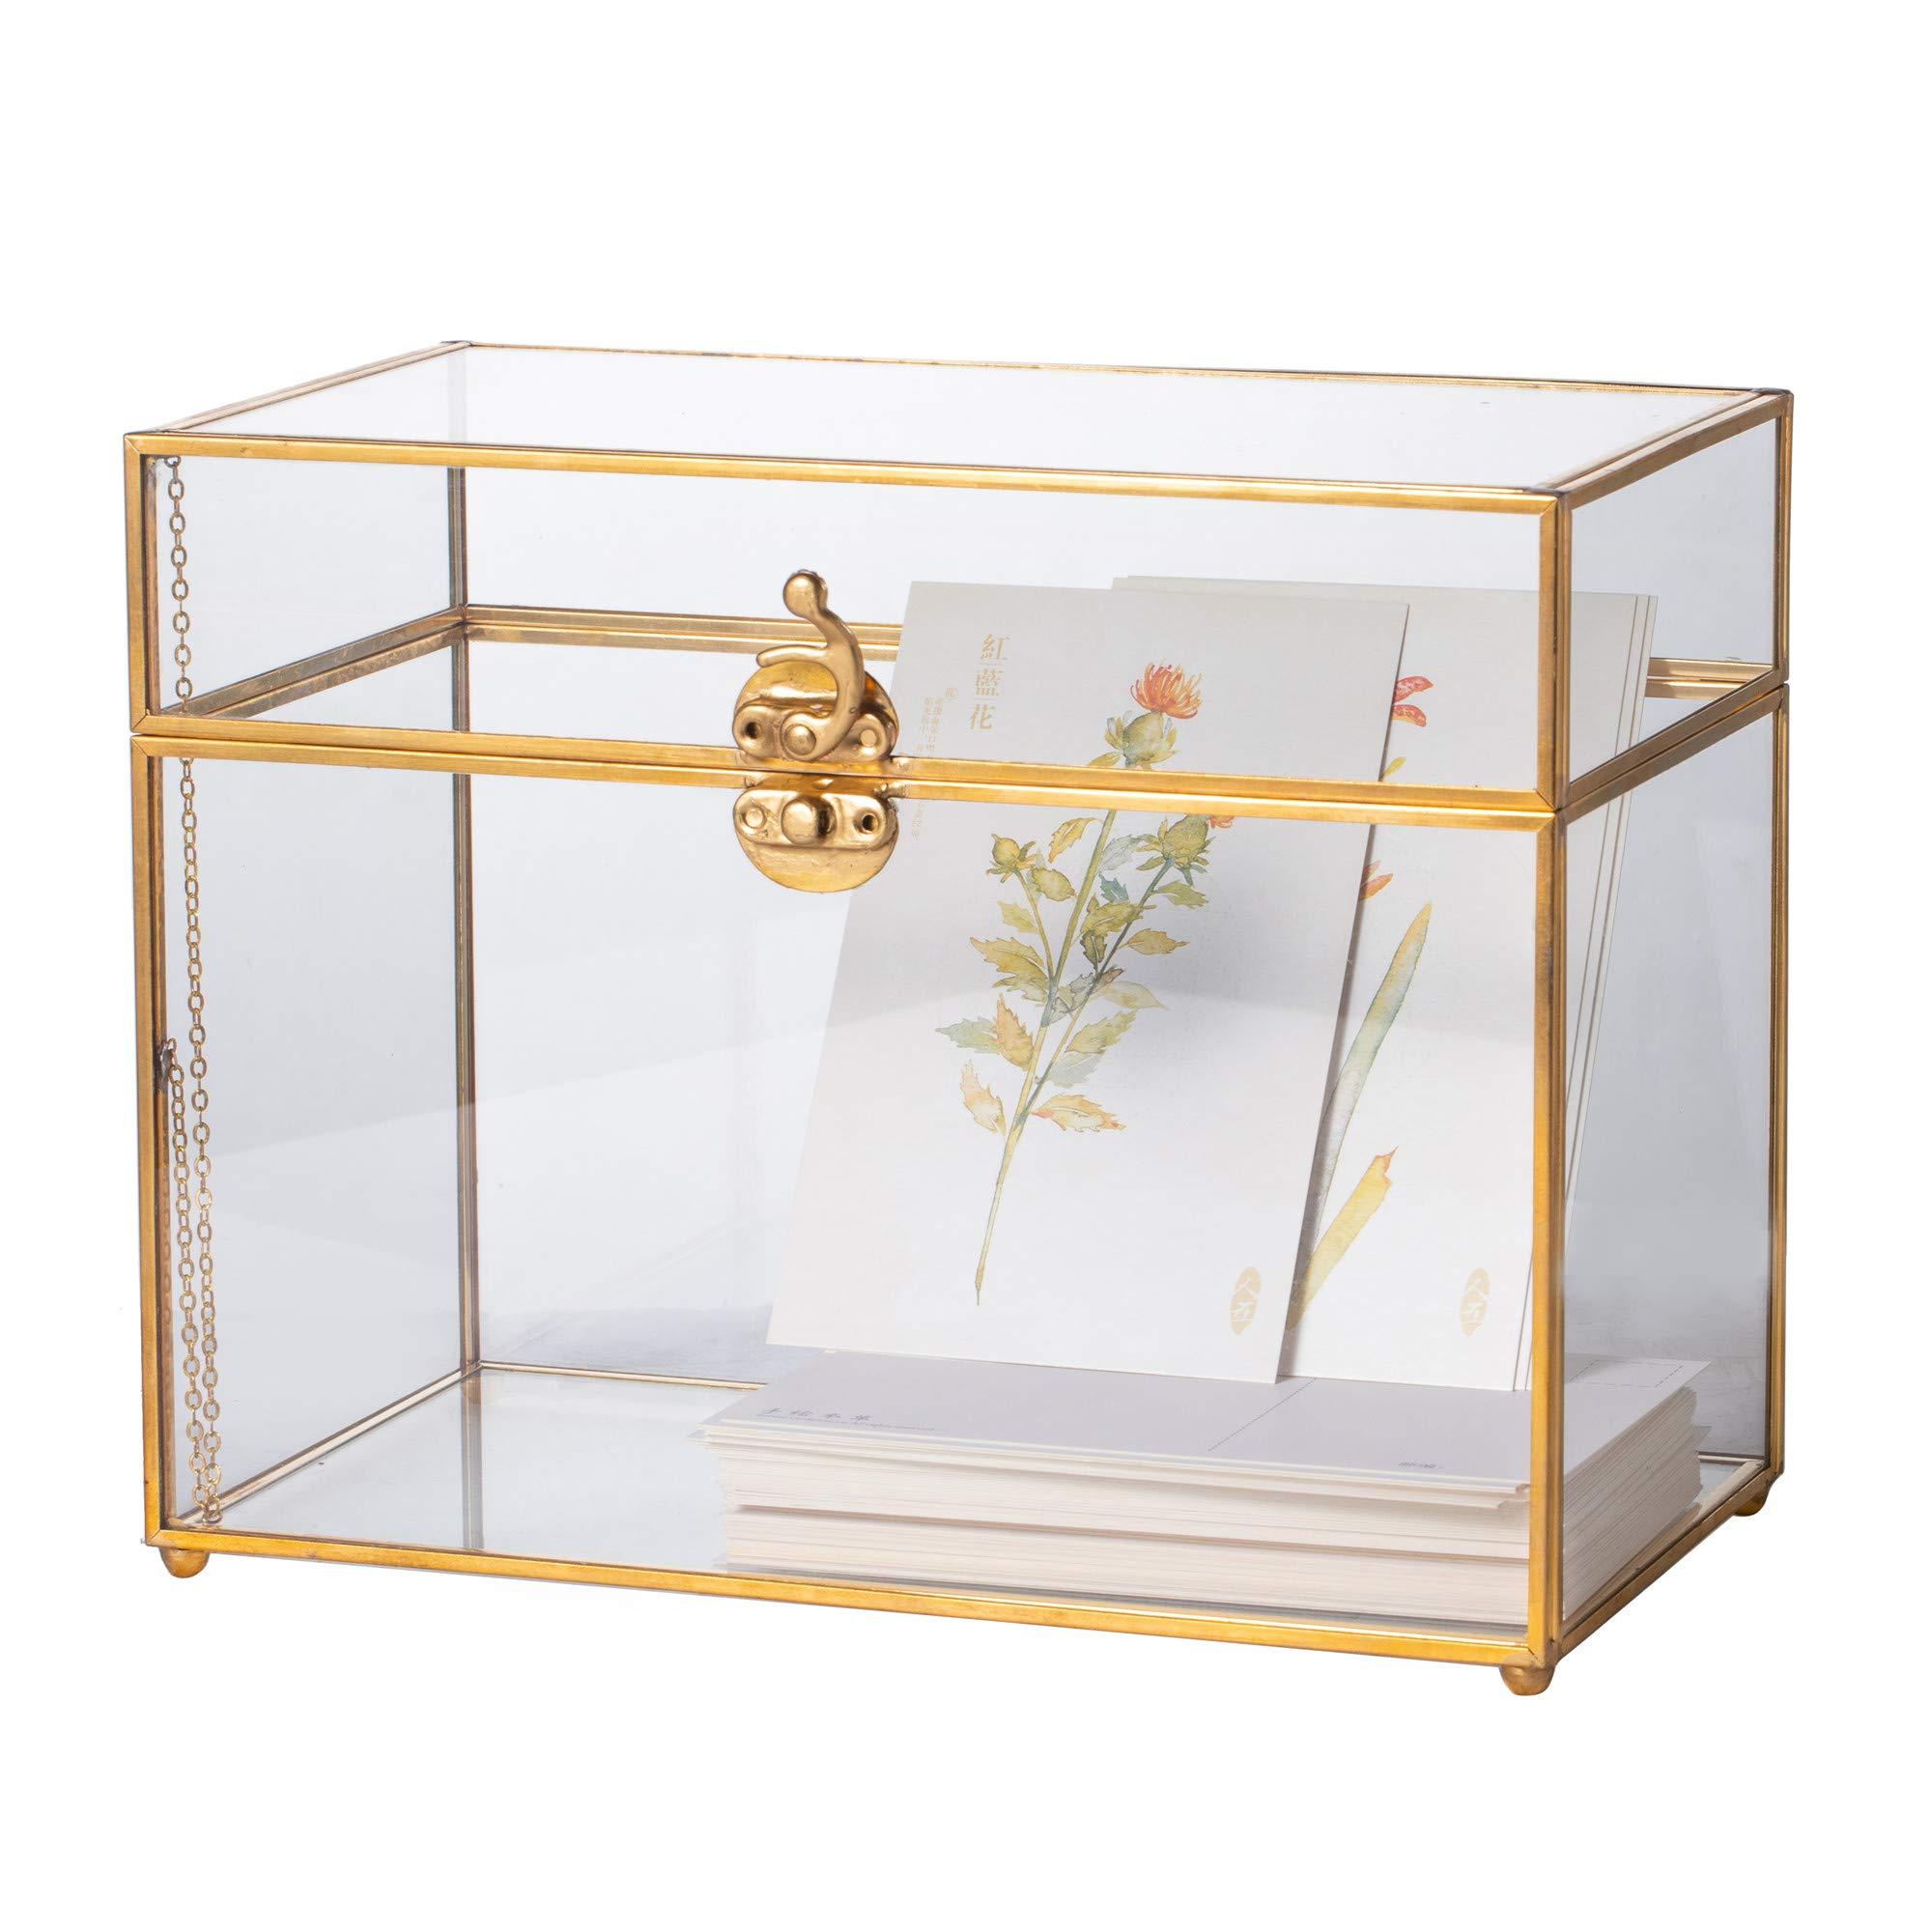 Long Foot Vintage Rectangle Geometric Glass Card Box Organizer Terrarium with Lock Centerpiece Decor Window Tabletop Planter Handmade Garden Patio Square Copper House Flower Pot for Plants Succulets